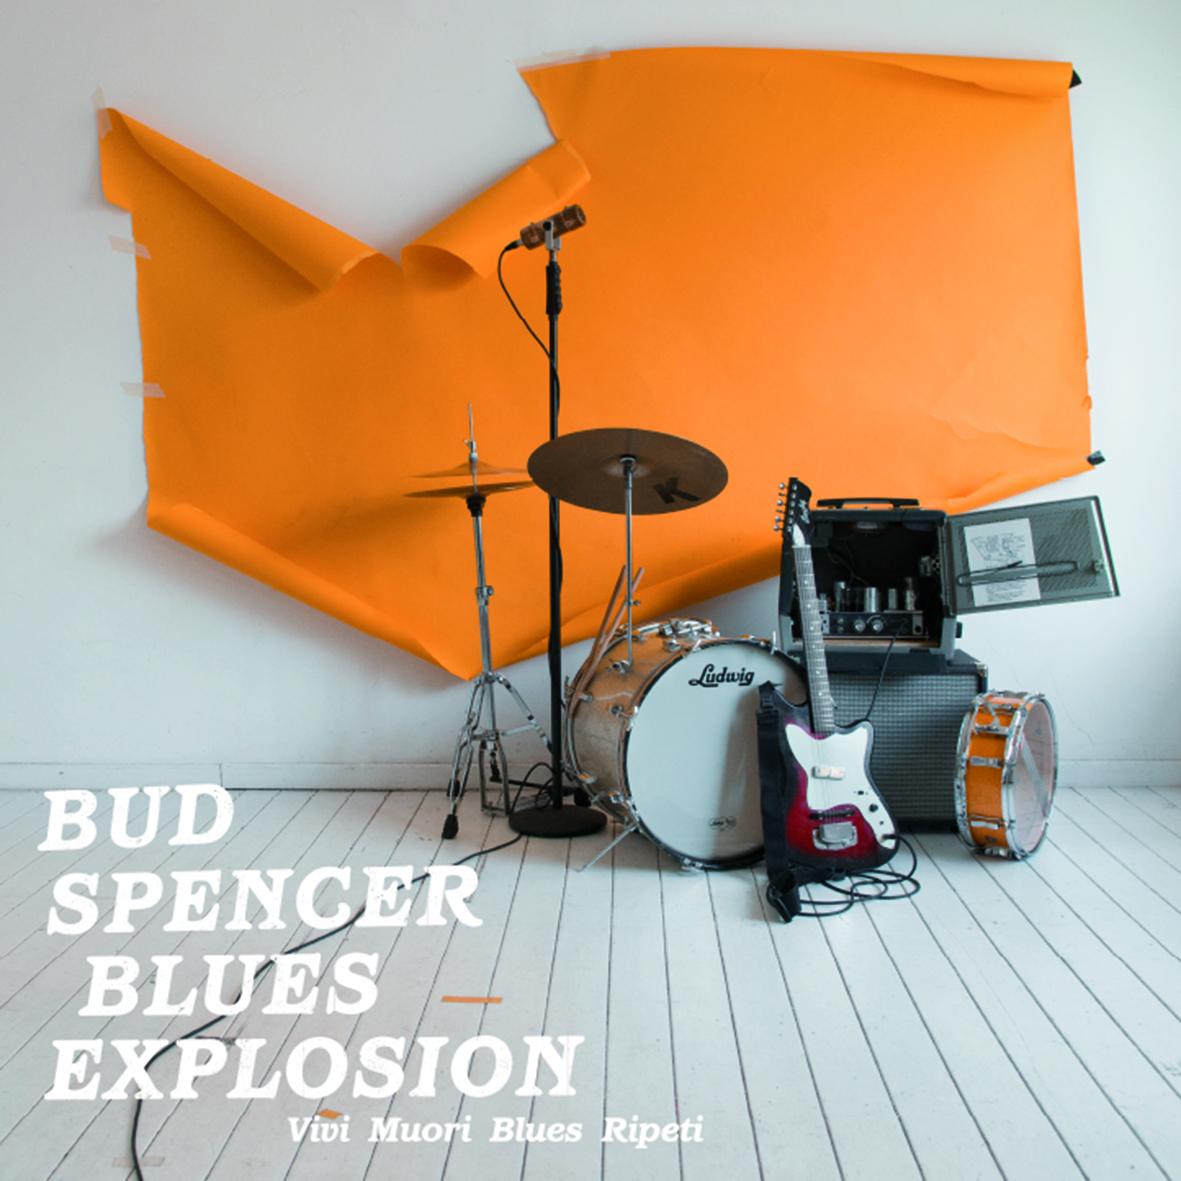 BudSpencerBluesExplosion_VMBR_Cover_alta_ris.jpg